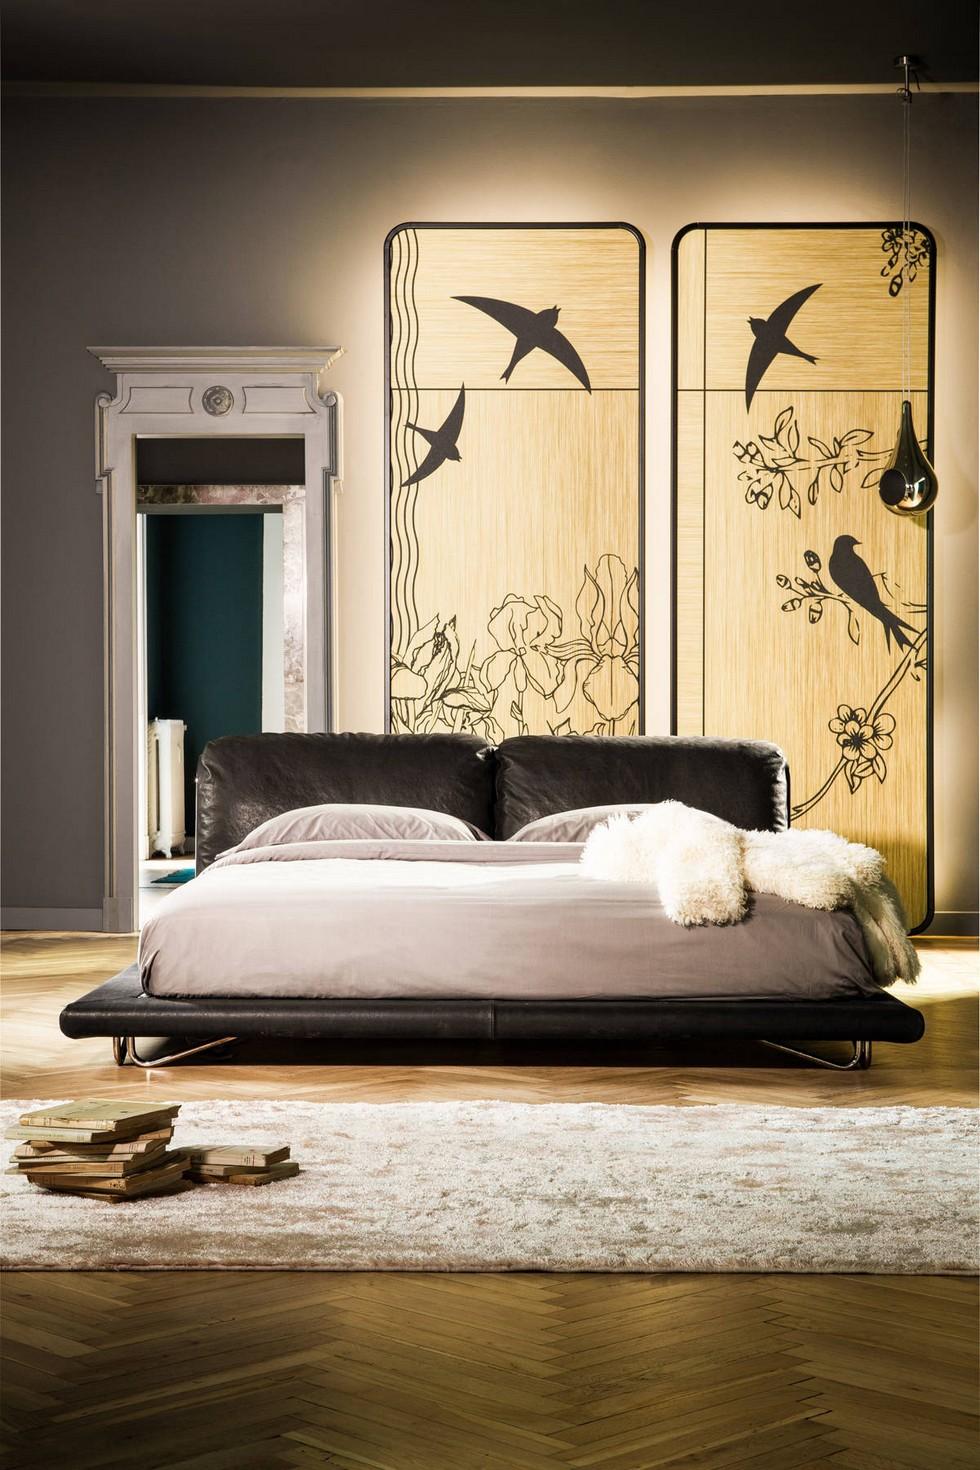 Bedroom ideas by Maison Giopagani best milan showrooms Best Milan showrooms to visit today – Atelier Maison Giopagani Best Milan showrooms to visit today Atelier Maison Giopagani 3